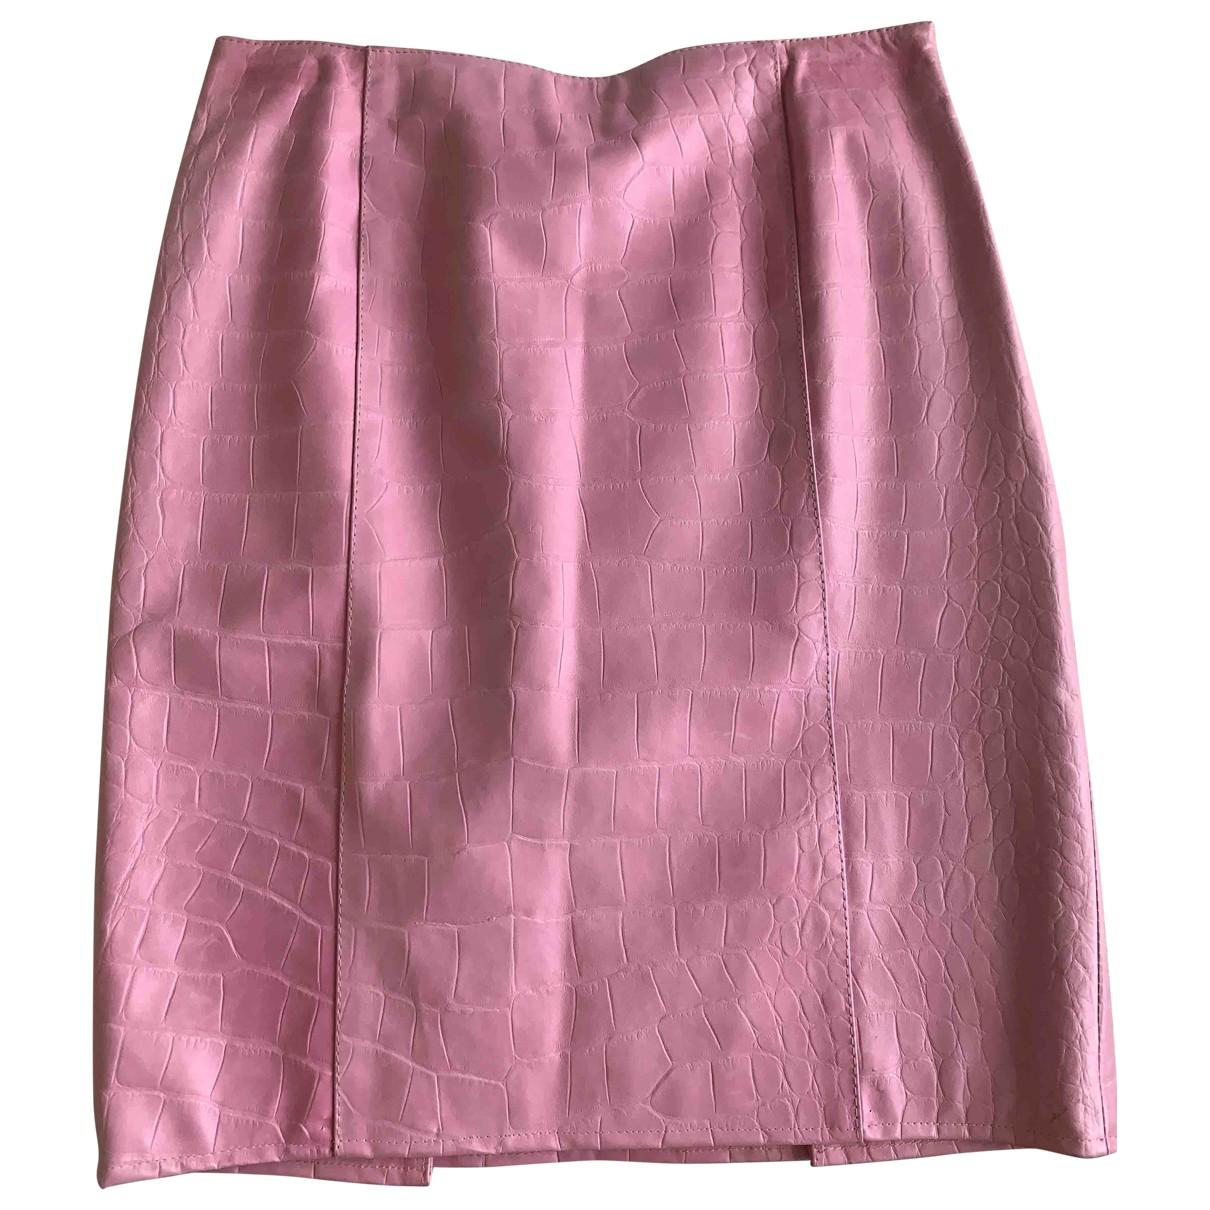 Valentino Garavani \N Pink Leather skirt for Women 40 IT